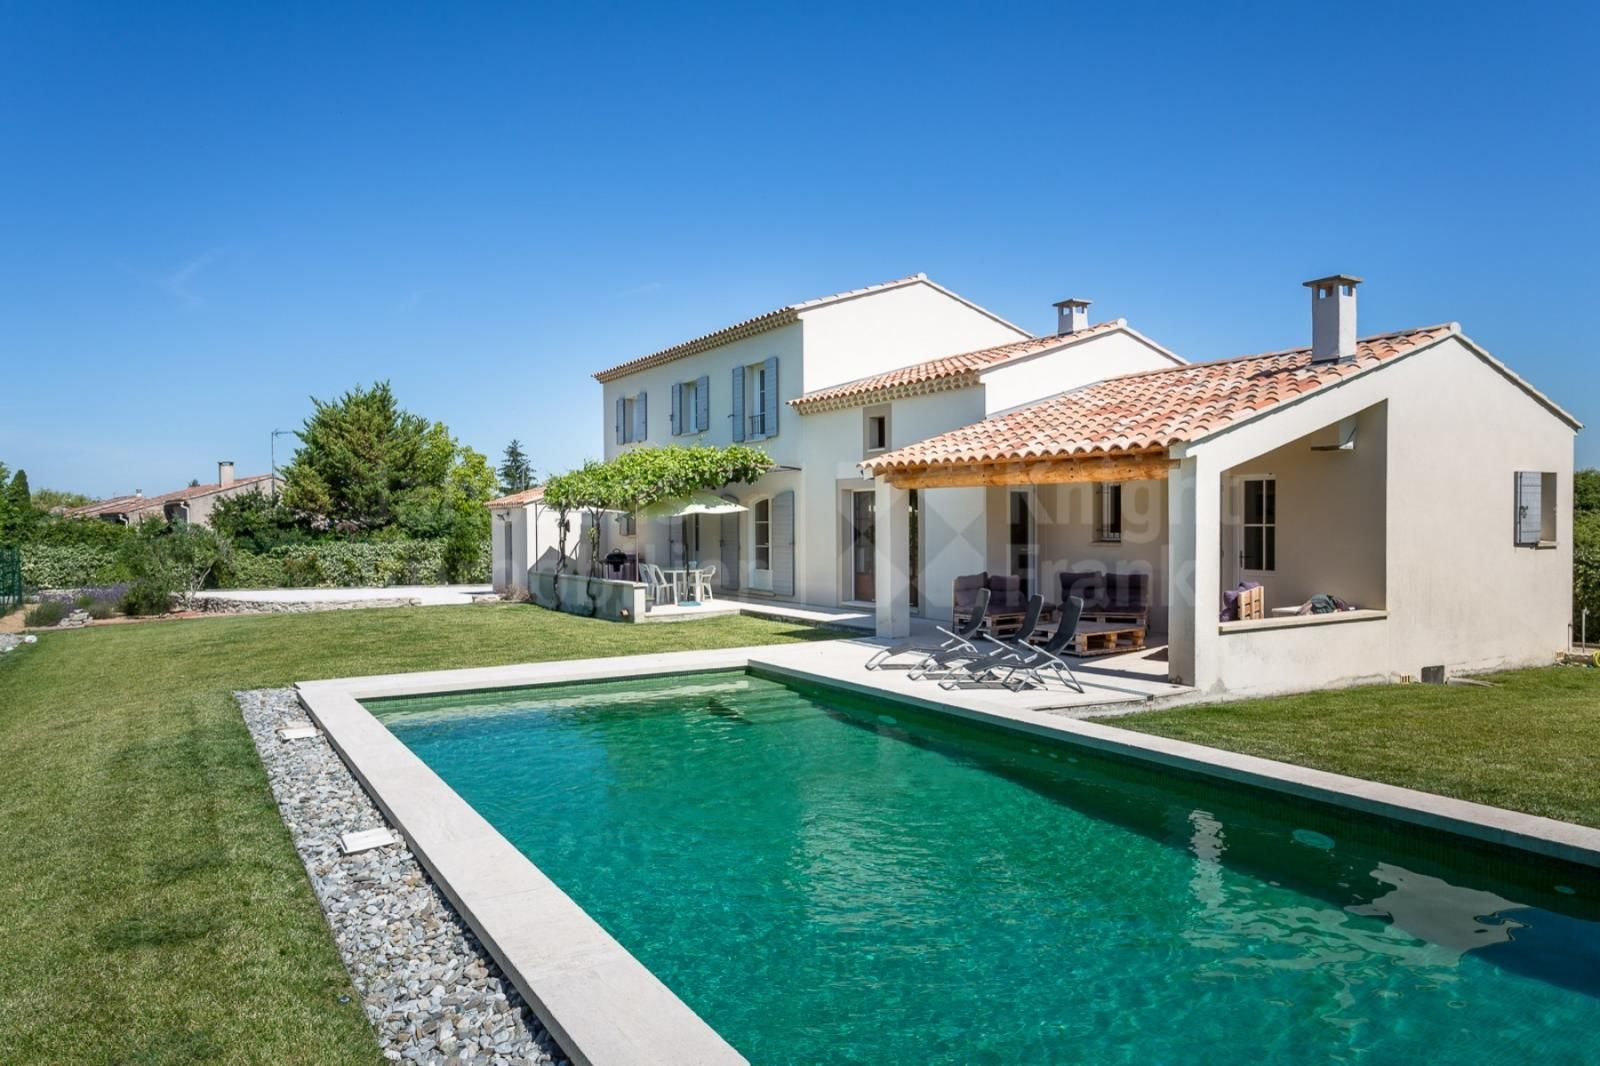 Beautiful Villa With A Swimming Pool For Sale Near L Isle Sur La Sorgue Janssens Immobilier Provence Beautiful Villas Swimming Pools Villa